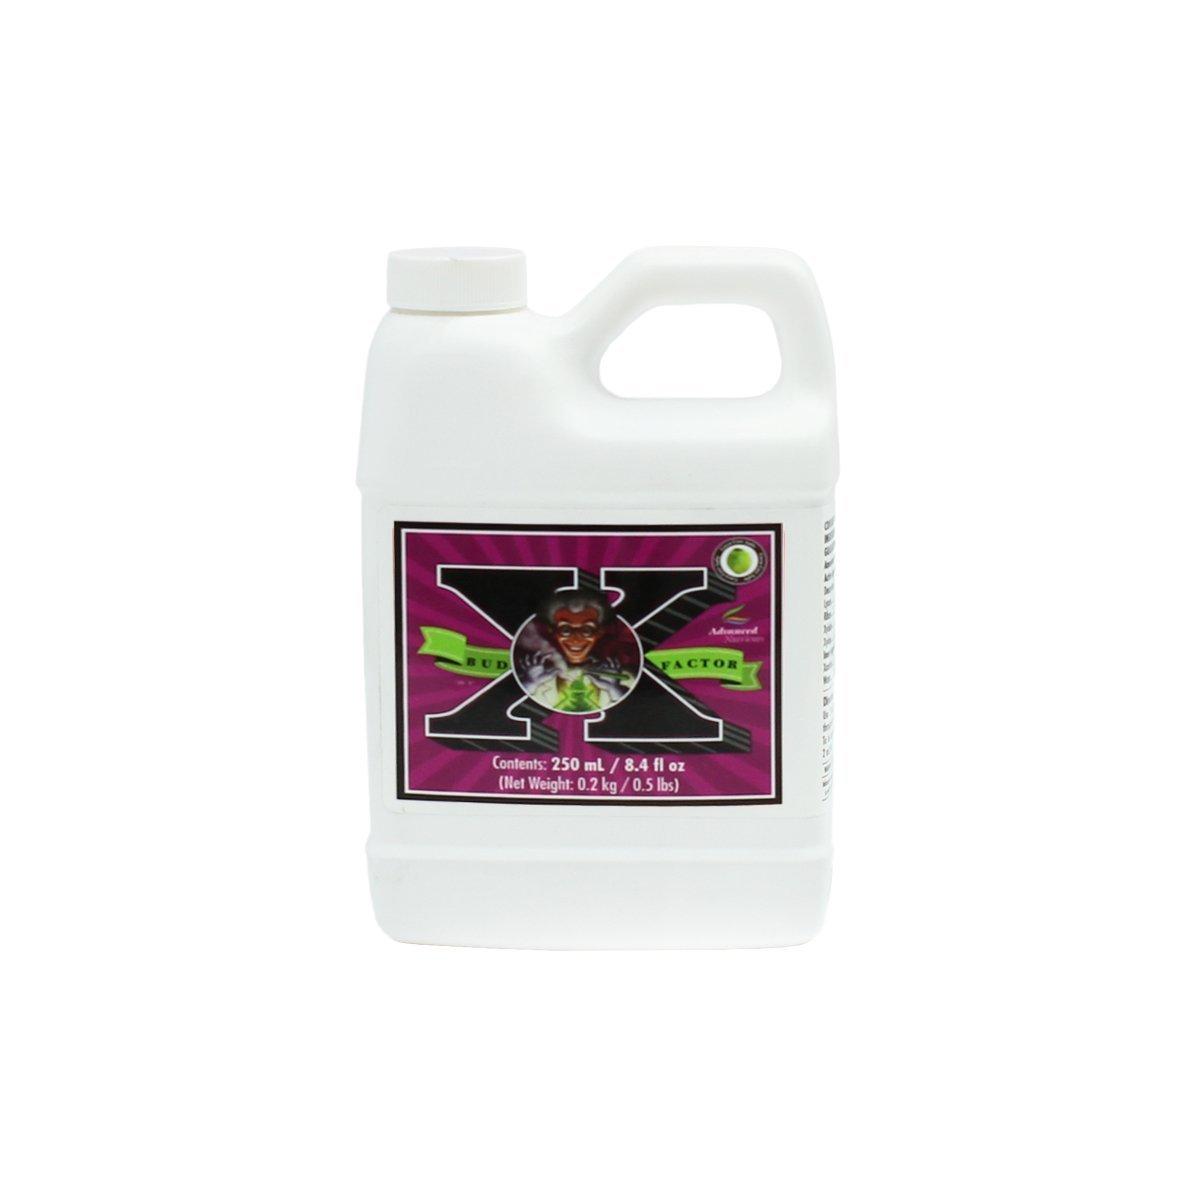 Advanced Nutrition Bud Factor X 250ml - Advanced Nutrients,Bloom Bud Boost Hydroponics